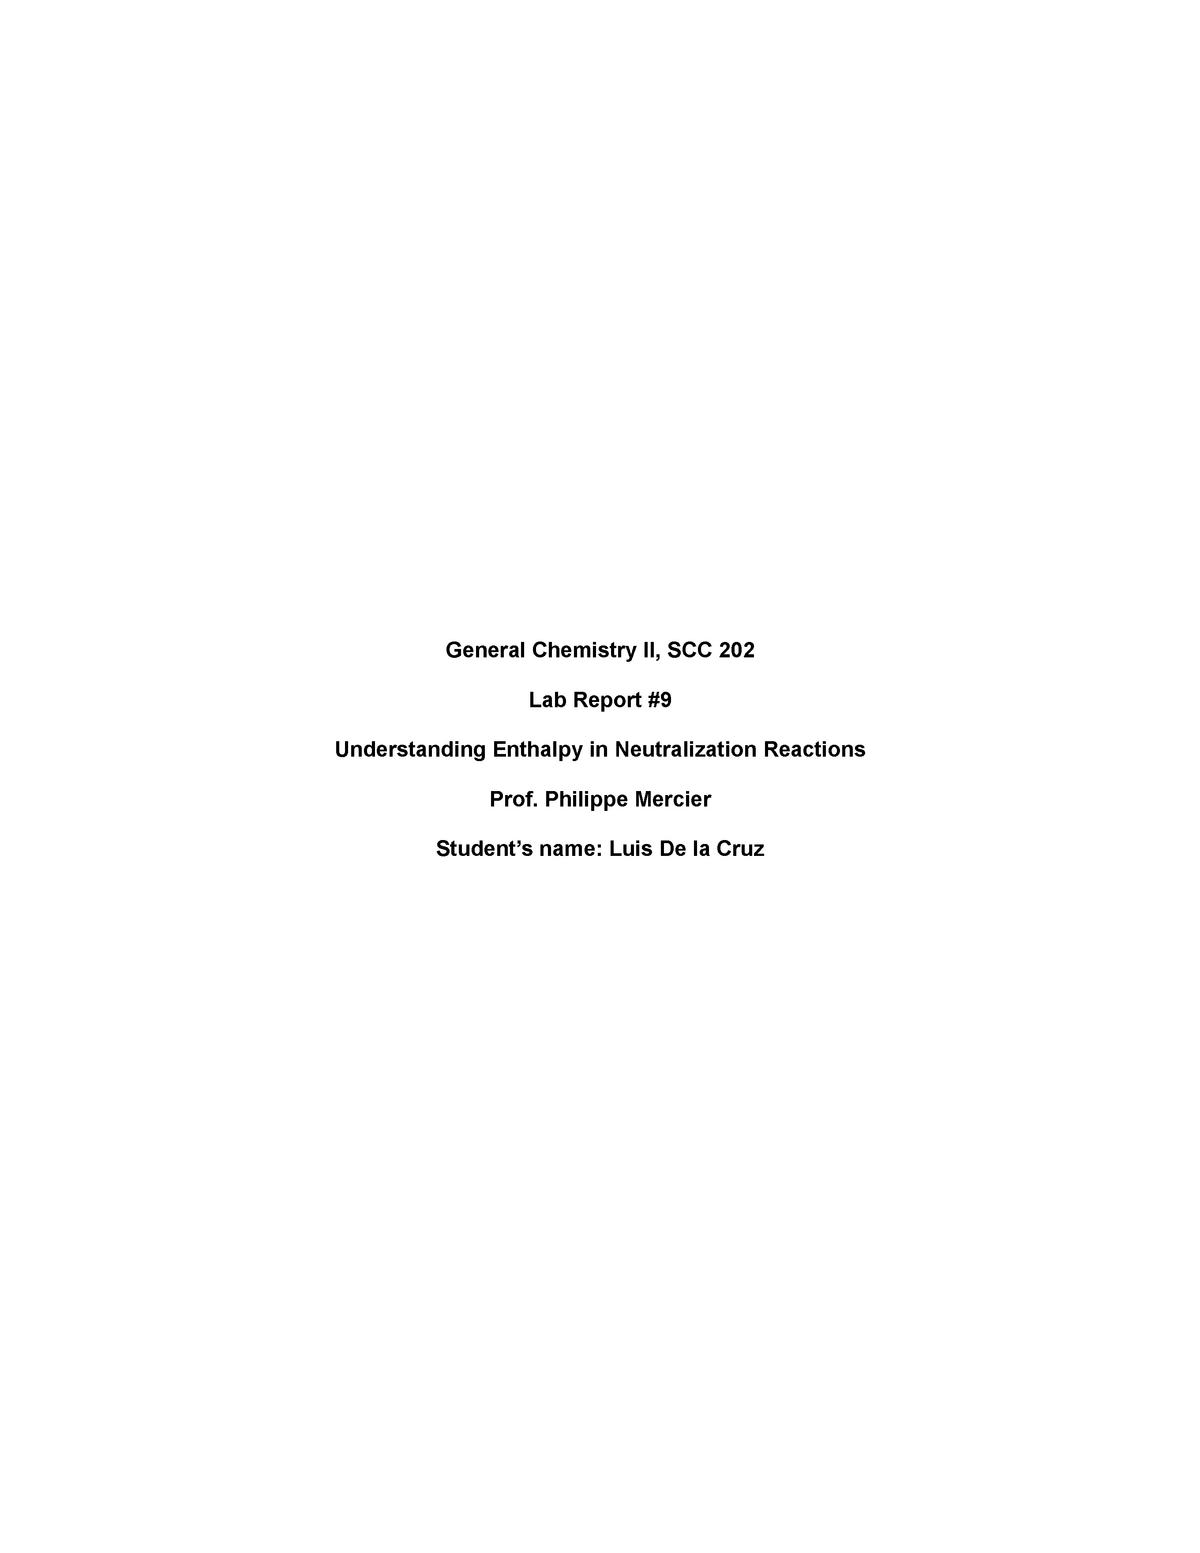 LAB Report #9 E- Portfolio - SCC 202: General Chemistry II